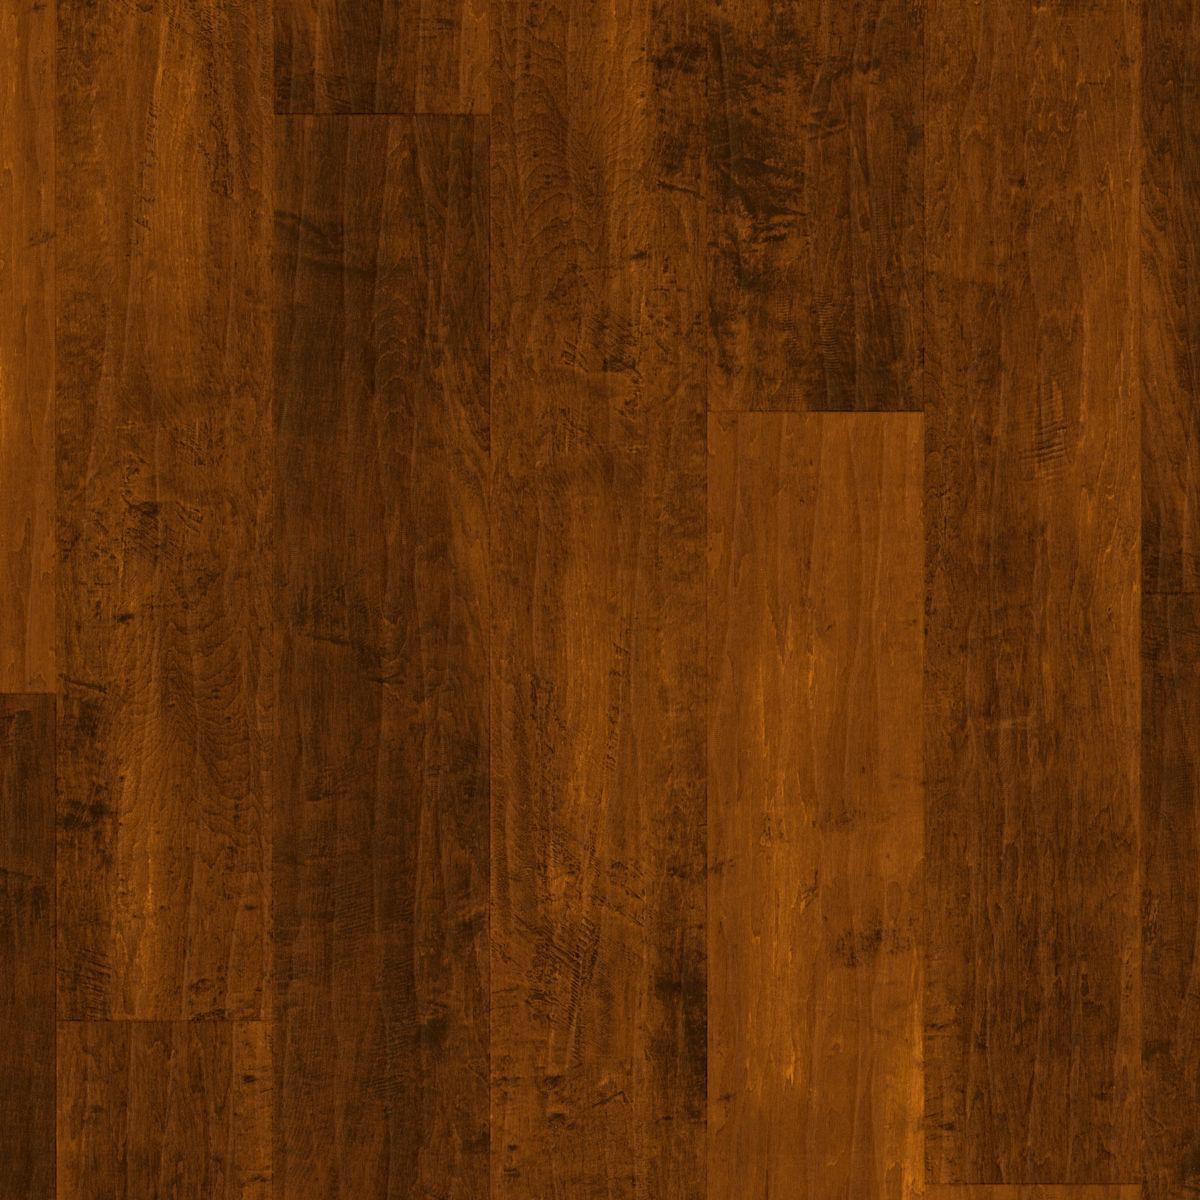 Karndean Art Select Spanish Cherry Rl05 Vinyl Flooring